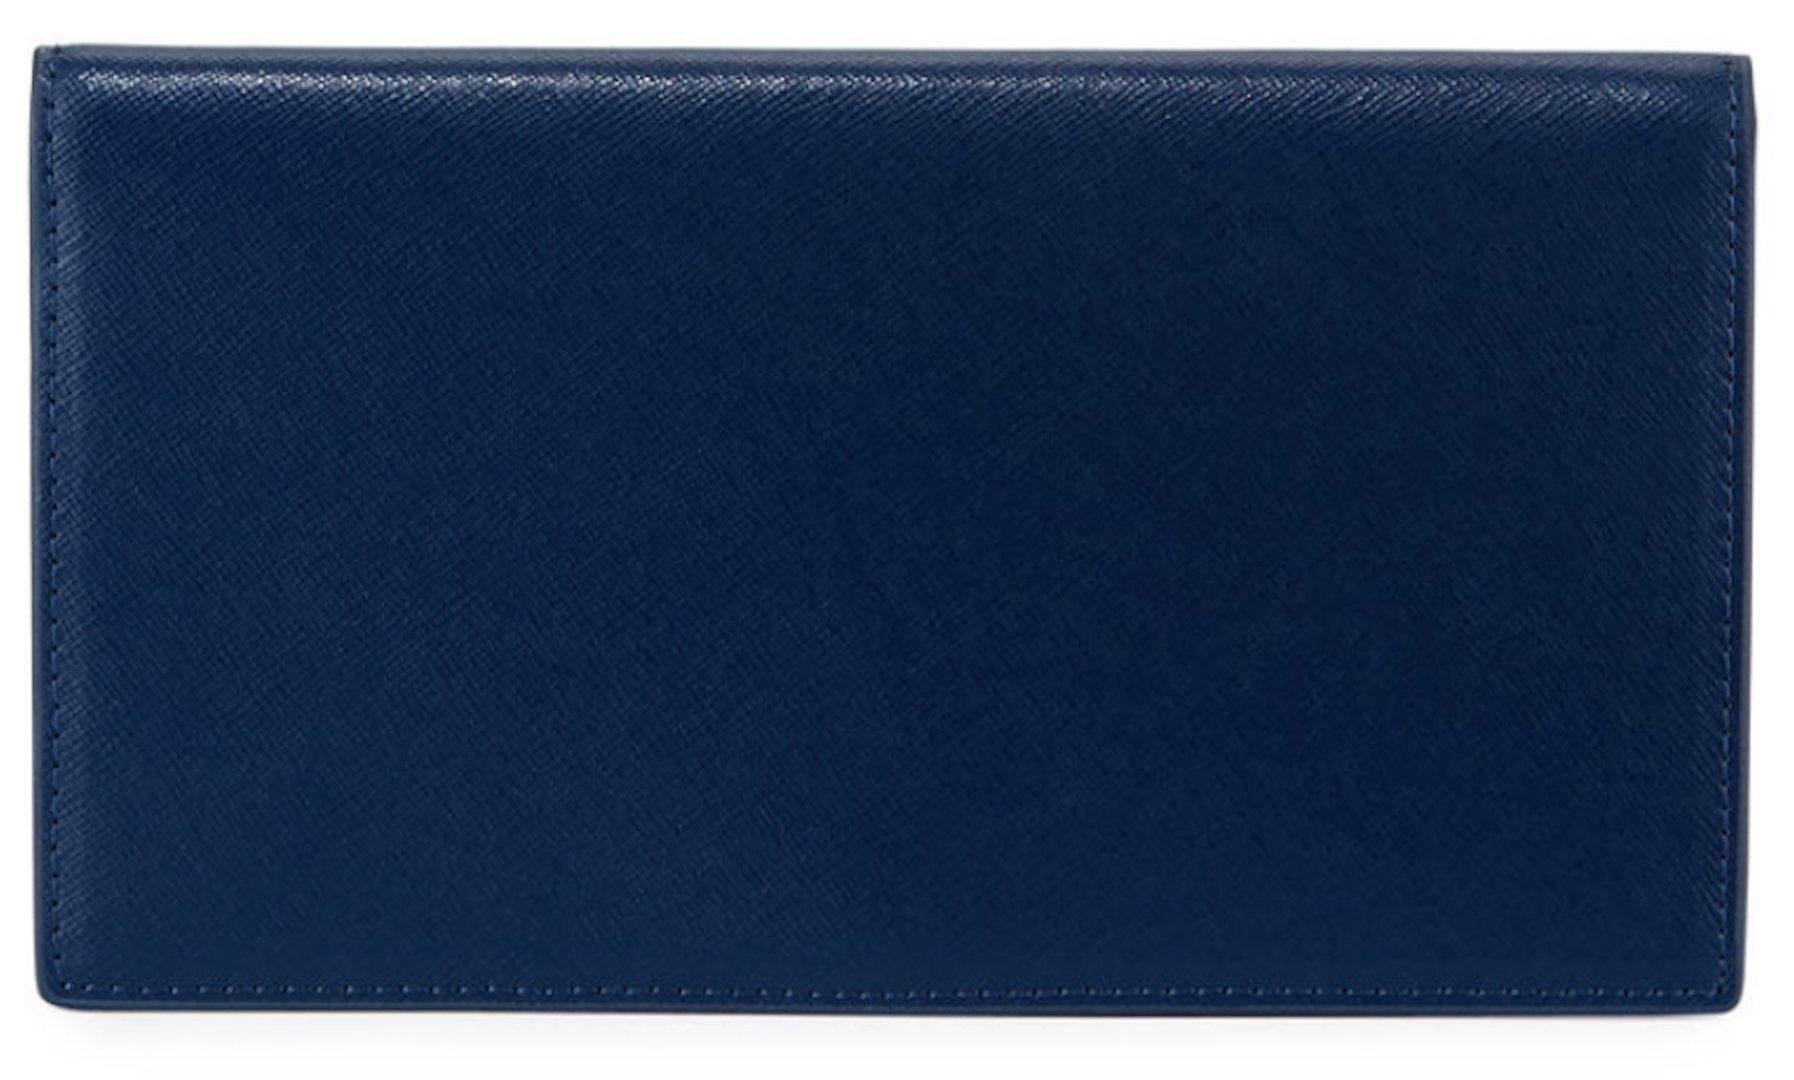 Neiman Marcus Slim Leather Bi-Fold Wallet